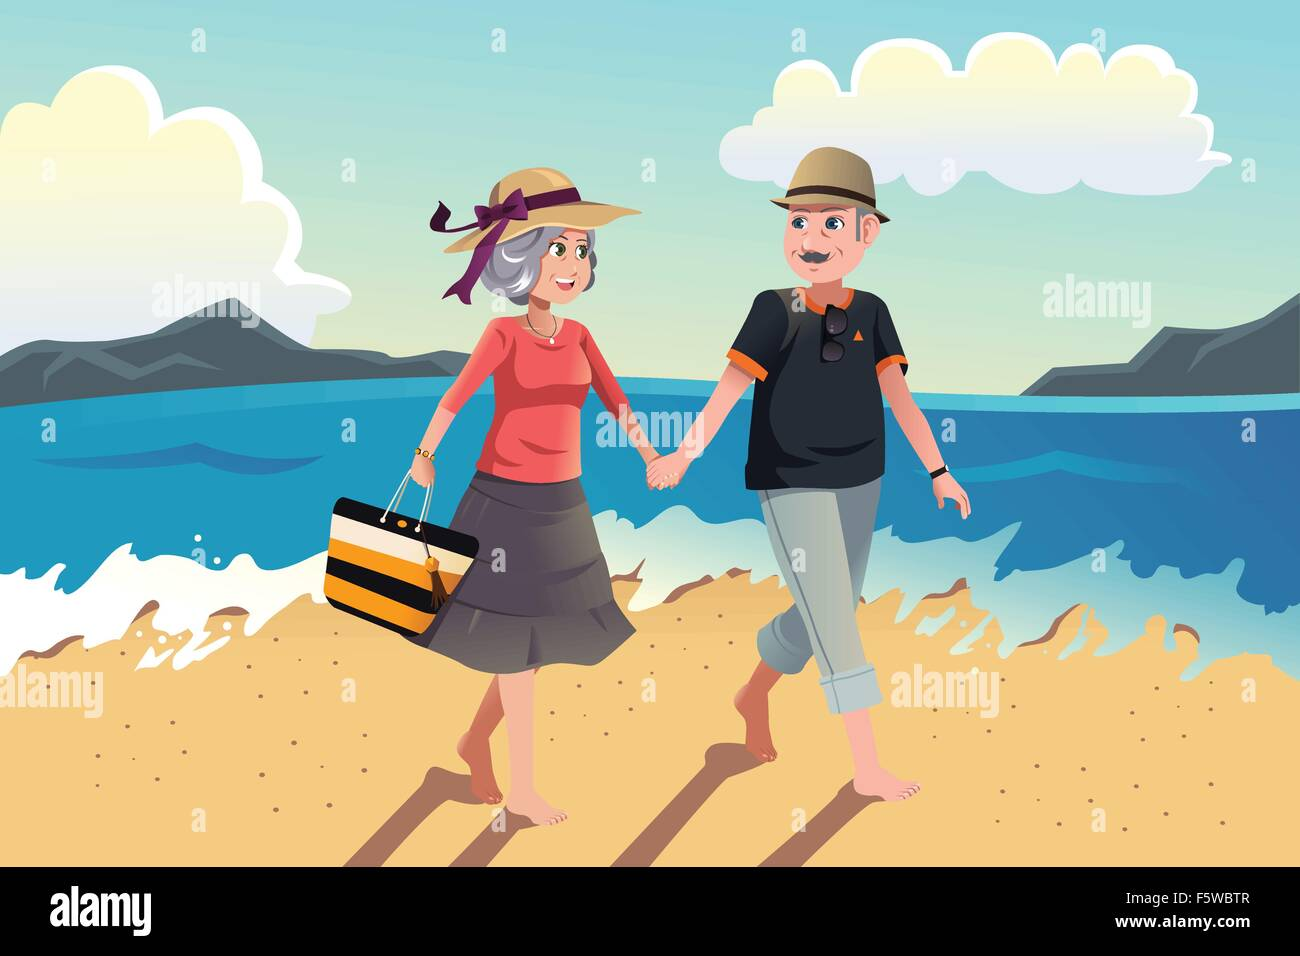 Eine Vektor-Illustration von älteres Paar am Strand Stockbild